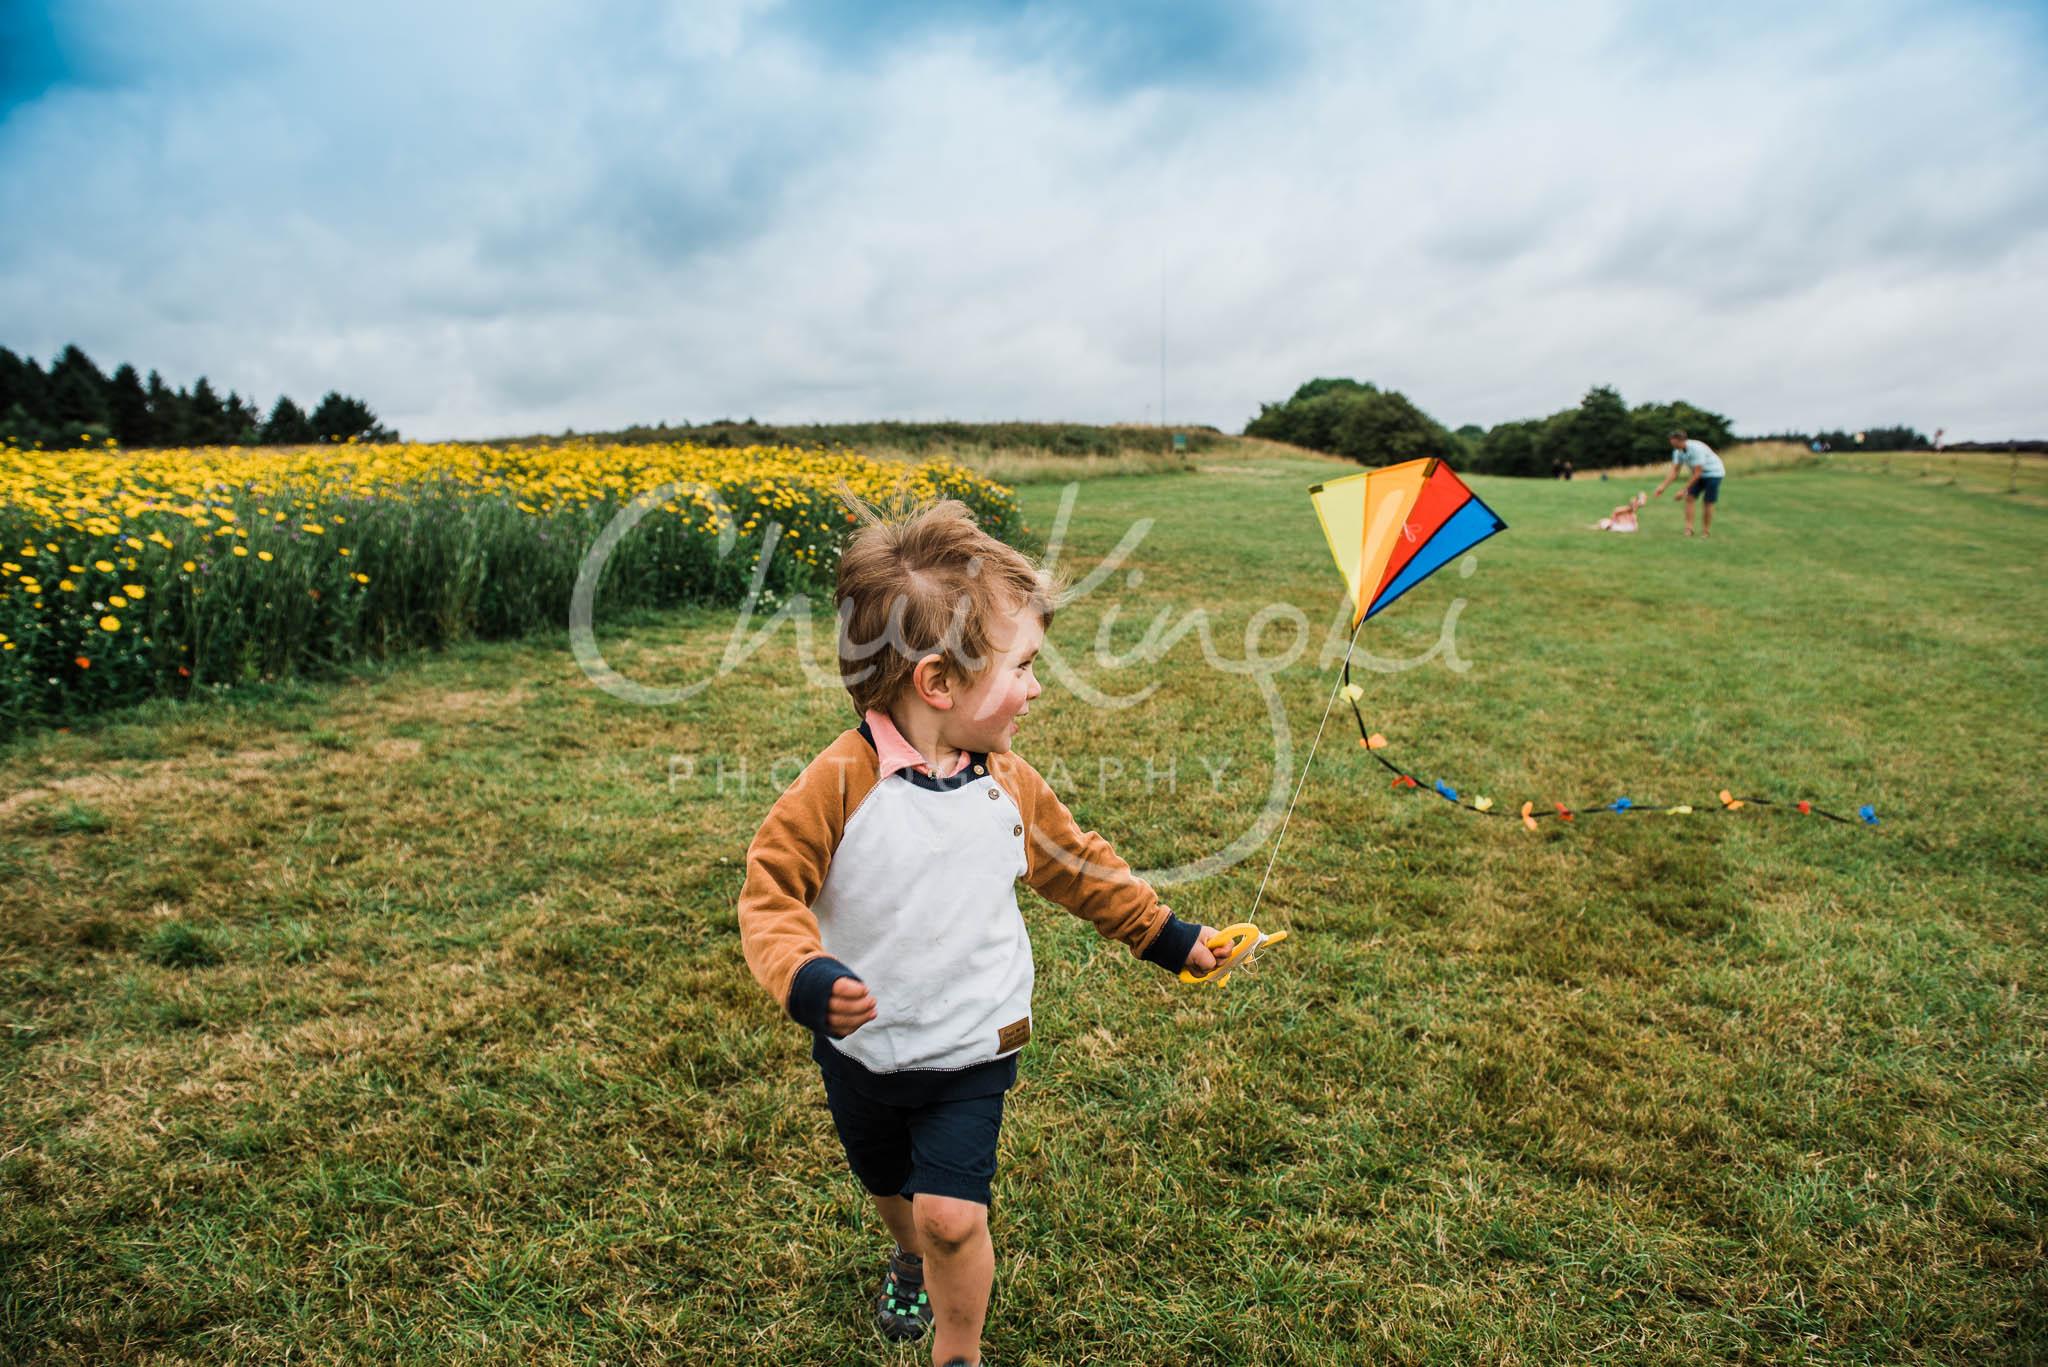 Bethan-Lavender2019-Chui-Photography-5606.jpg